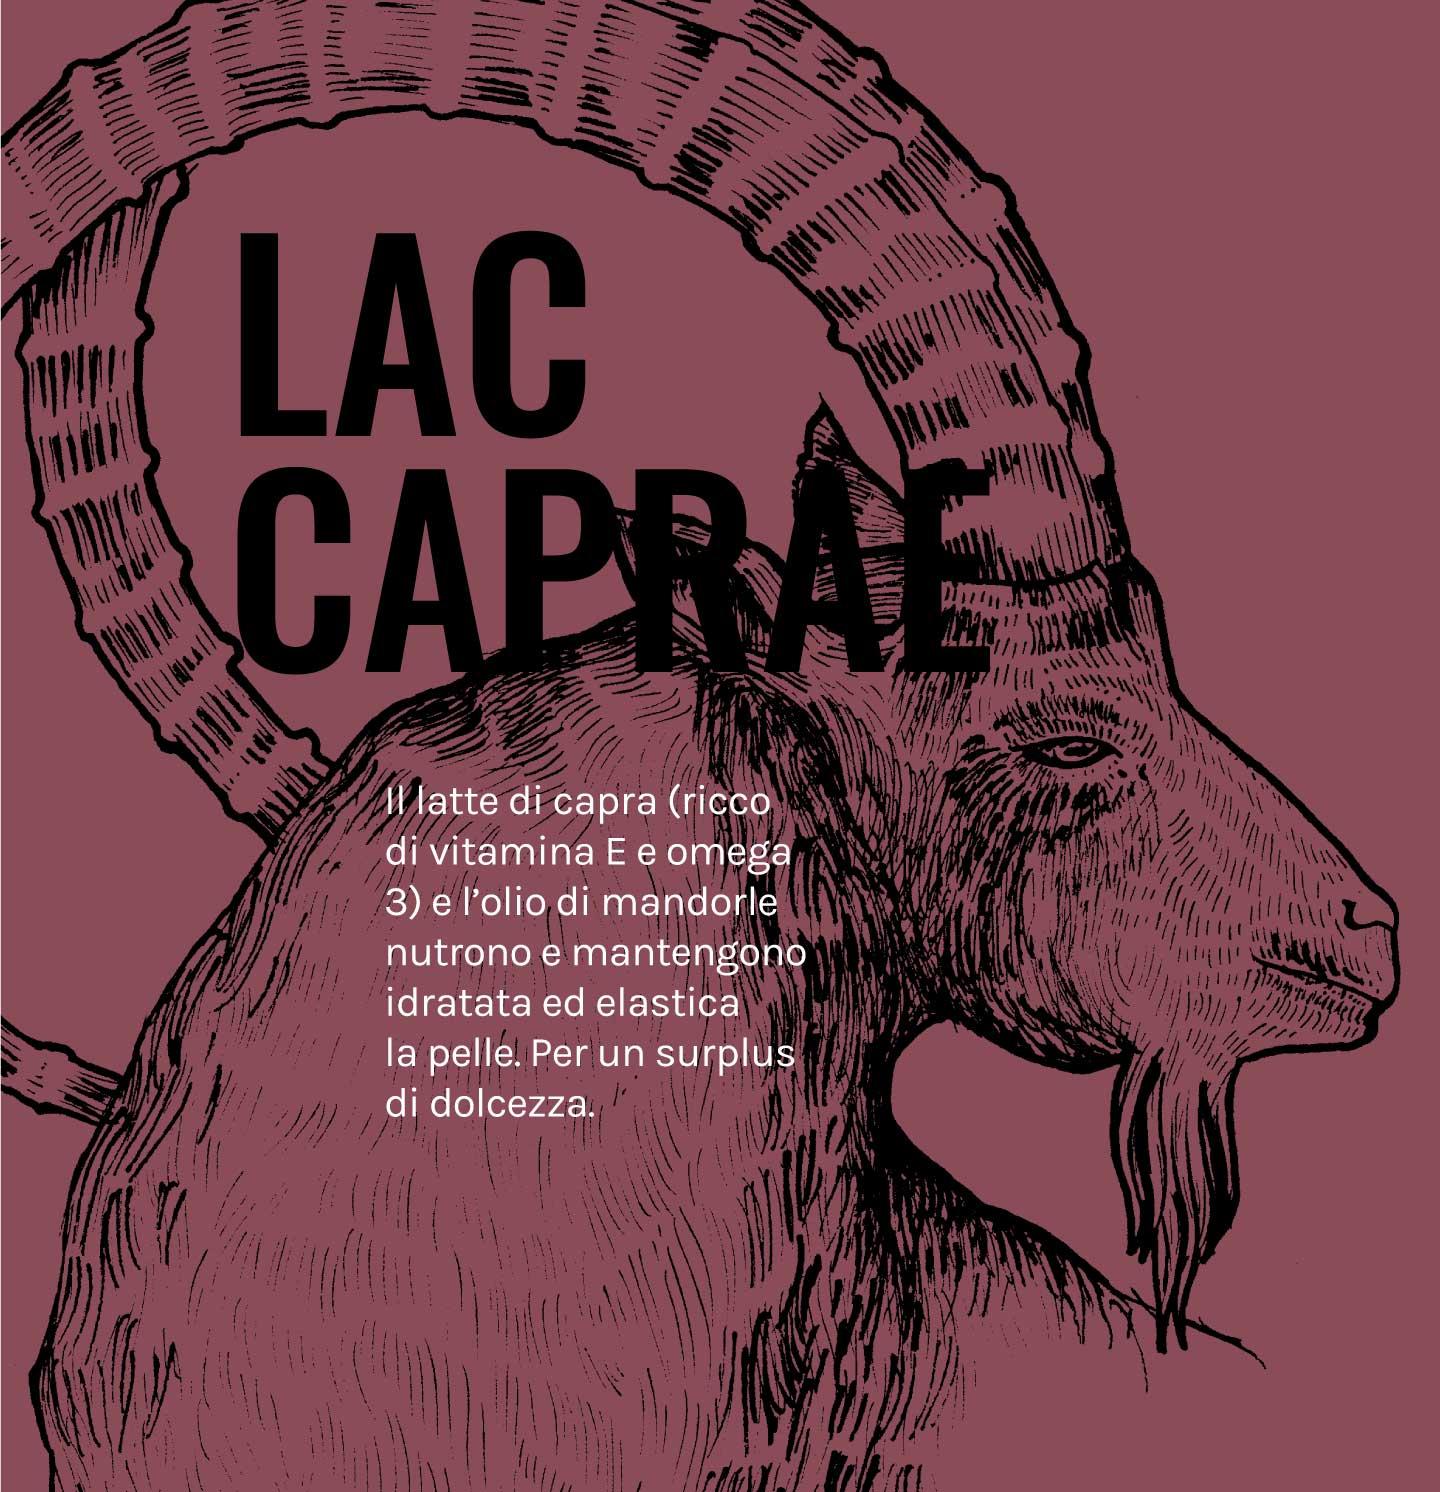 apothecarymilano_notebooks_bodycare_natural_lac_caprae_sx_v1